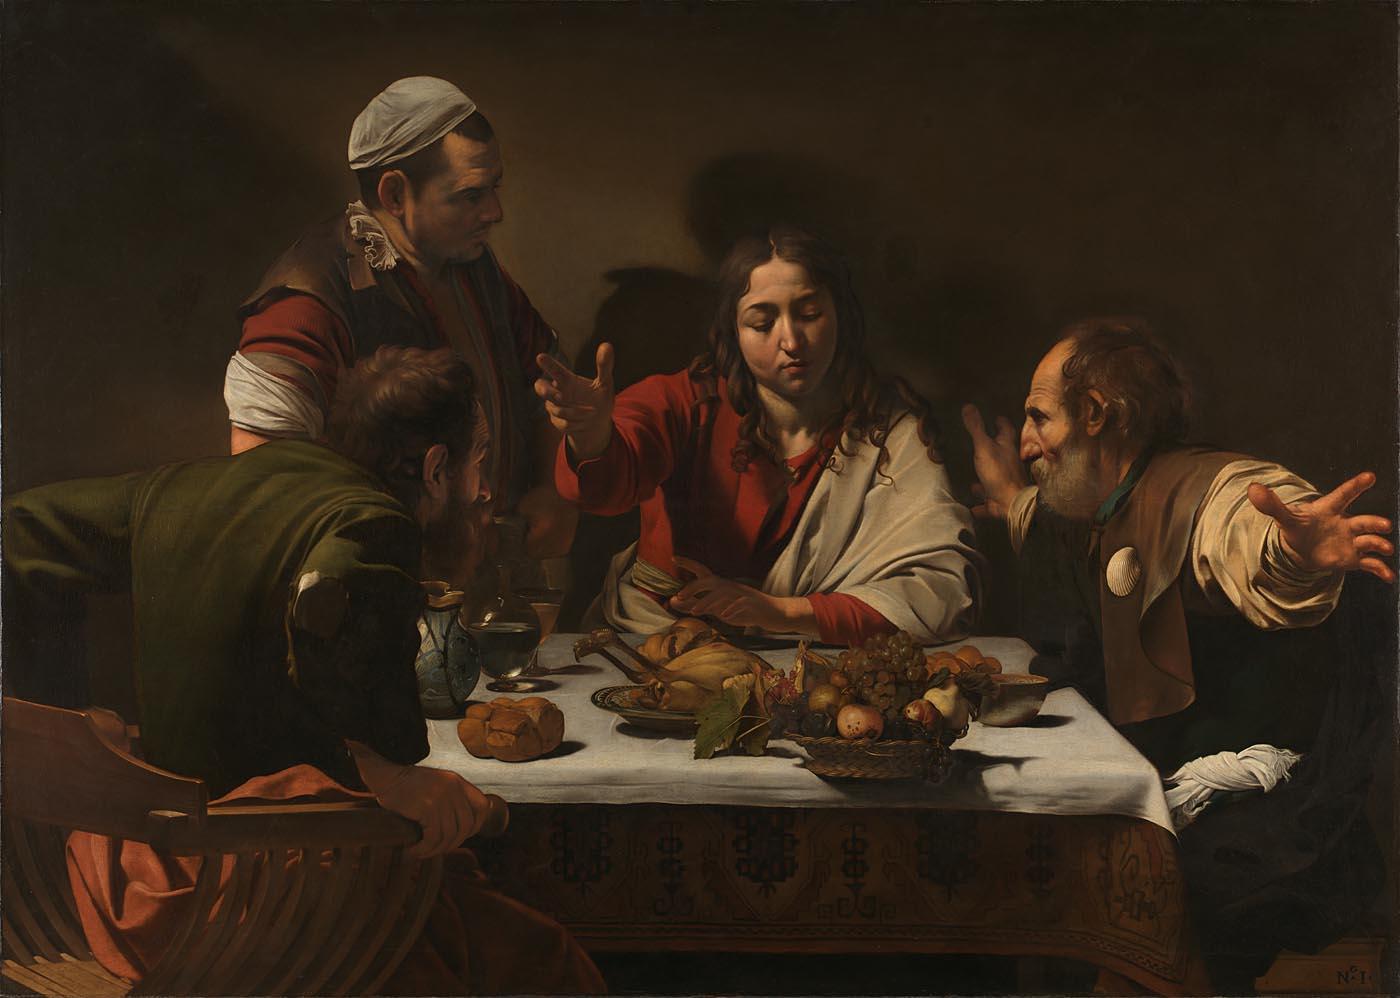 Michelangelo Merisi da Caravaggio, The Supper at Emmaus, 1601